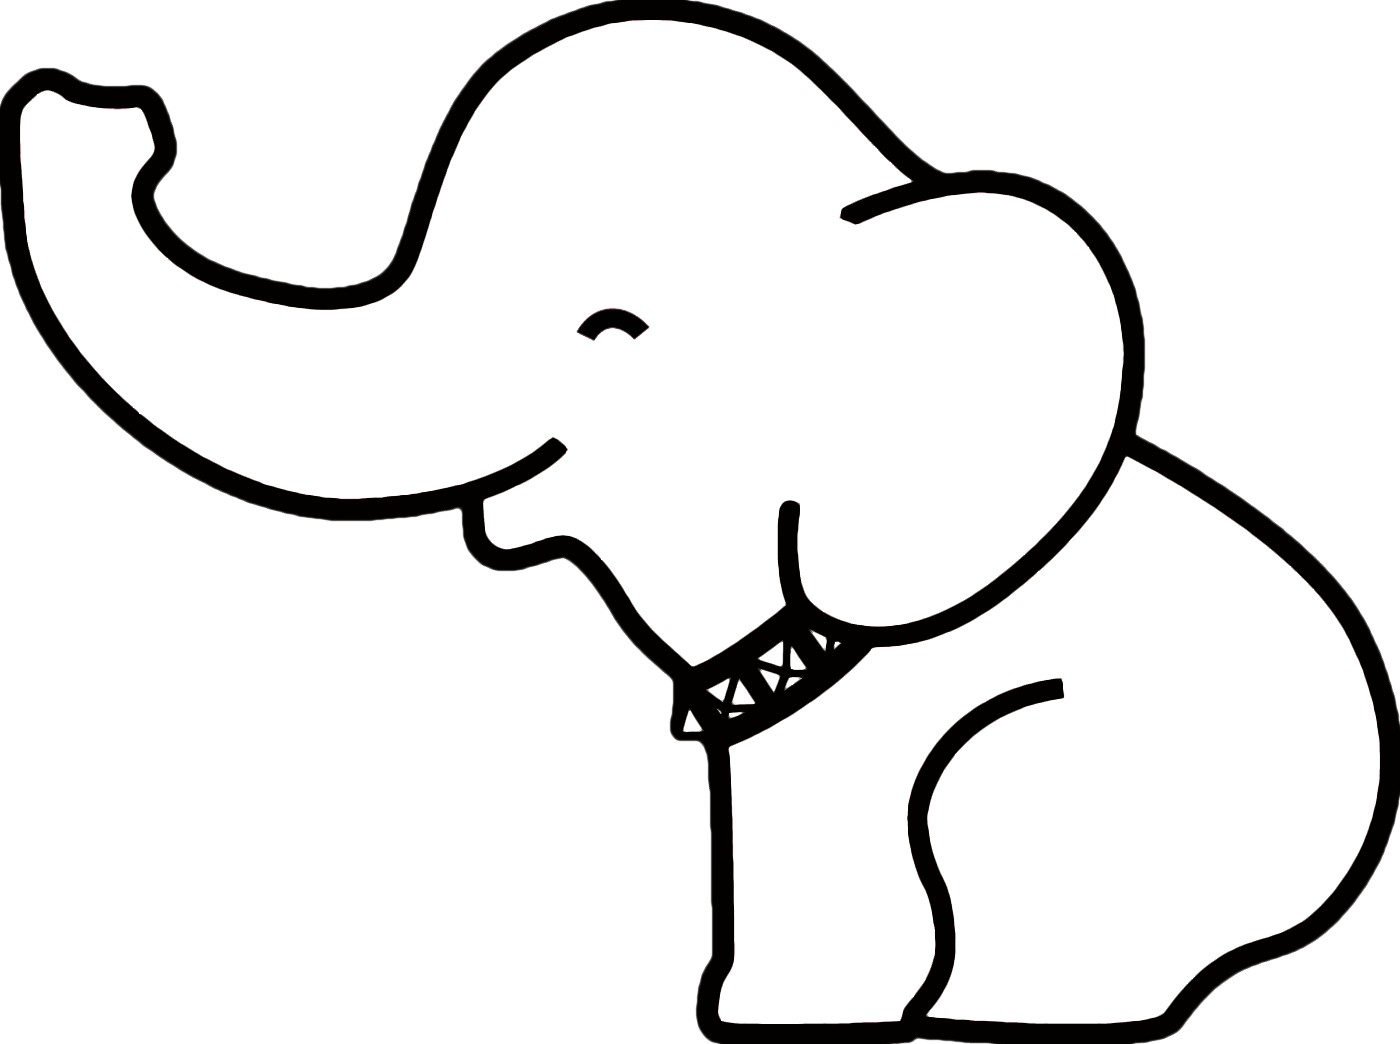 Transparent jpeg elephant clipart banner black and white Elmer elephant clipart transparent - ClipartFest banner black and white